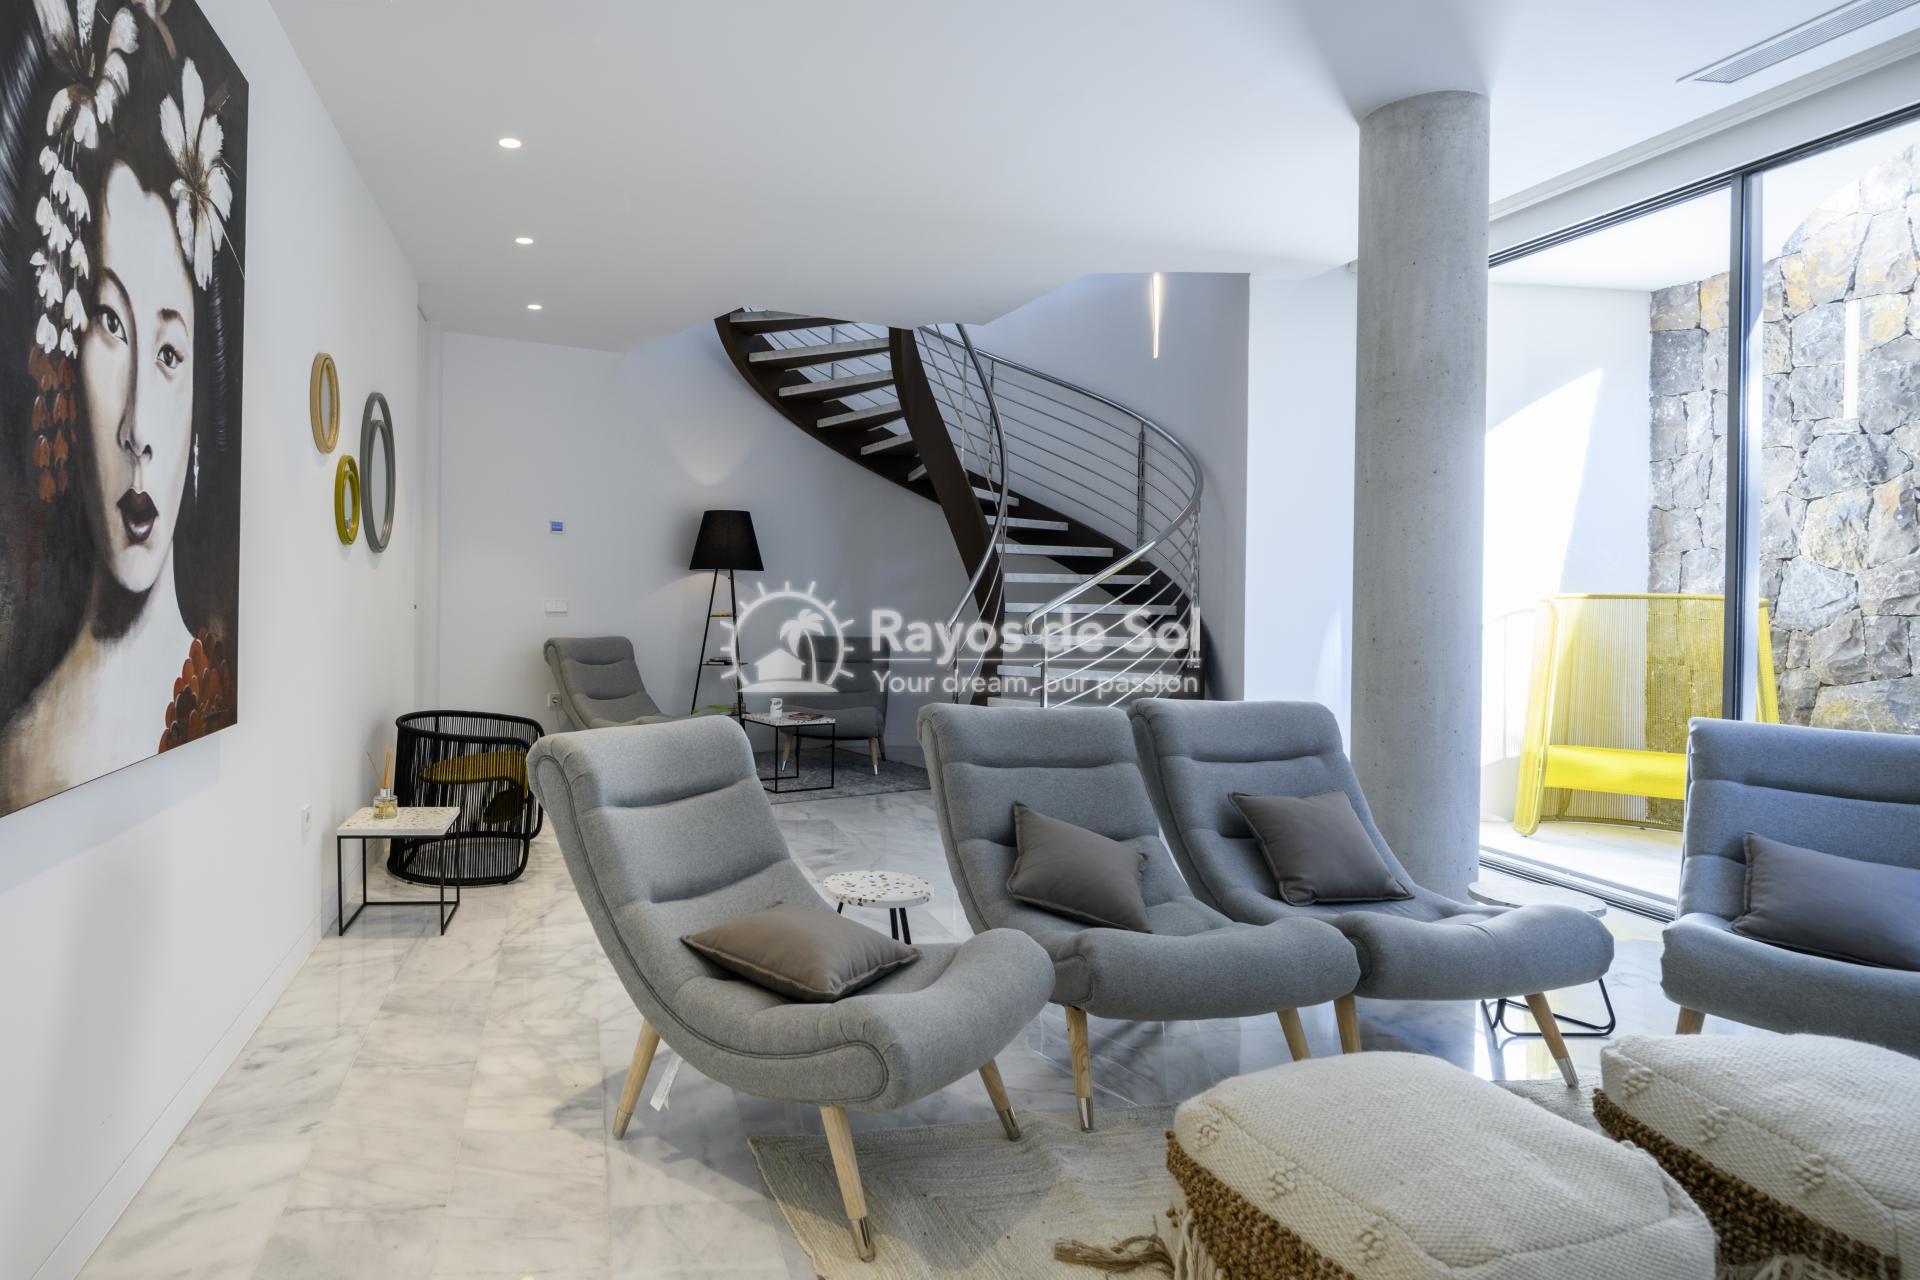 Stunning modern design villa  in Sierra Cortina, Finestrat, Costa Blanca (Praga 19) - 4